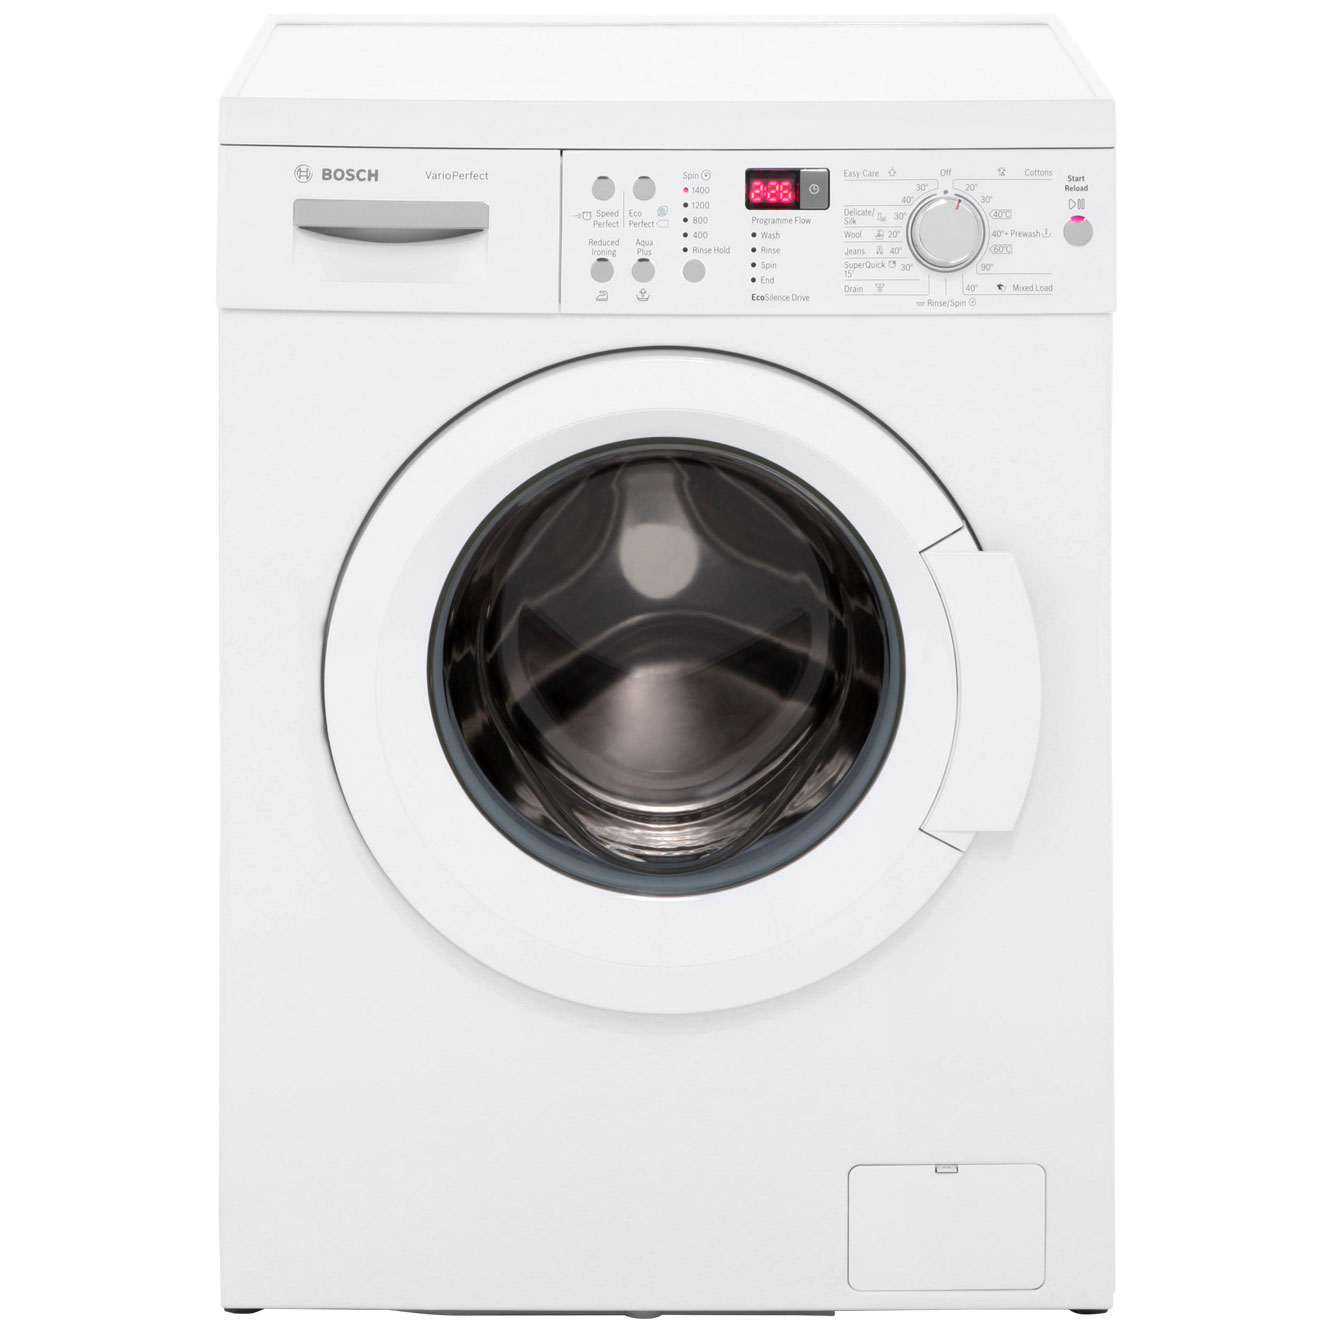 Bosch Serie 6 WAQ283S1GB Free Standing Washing Machine in White